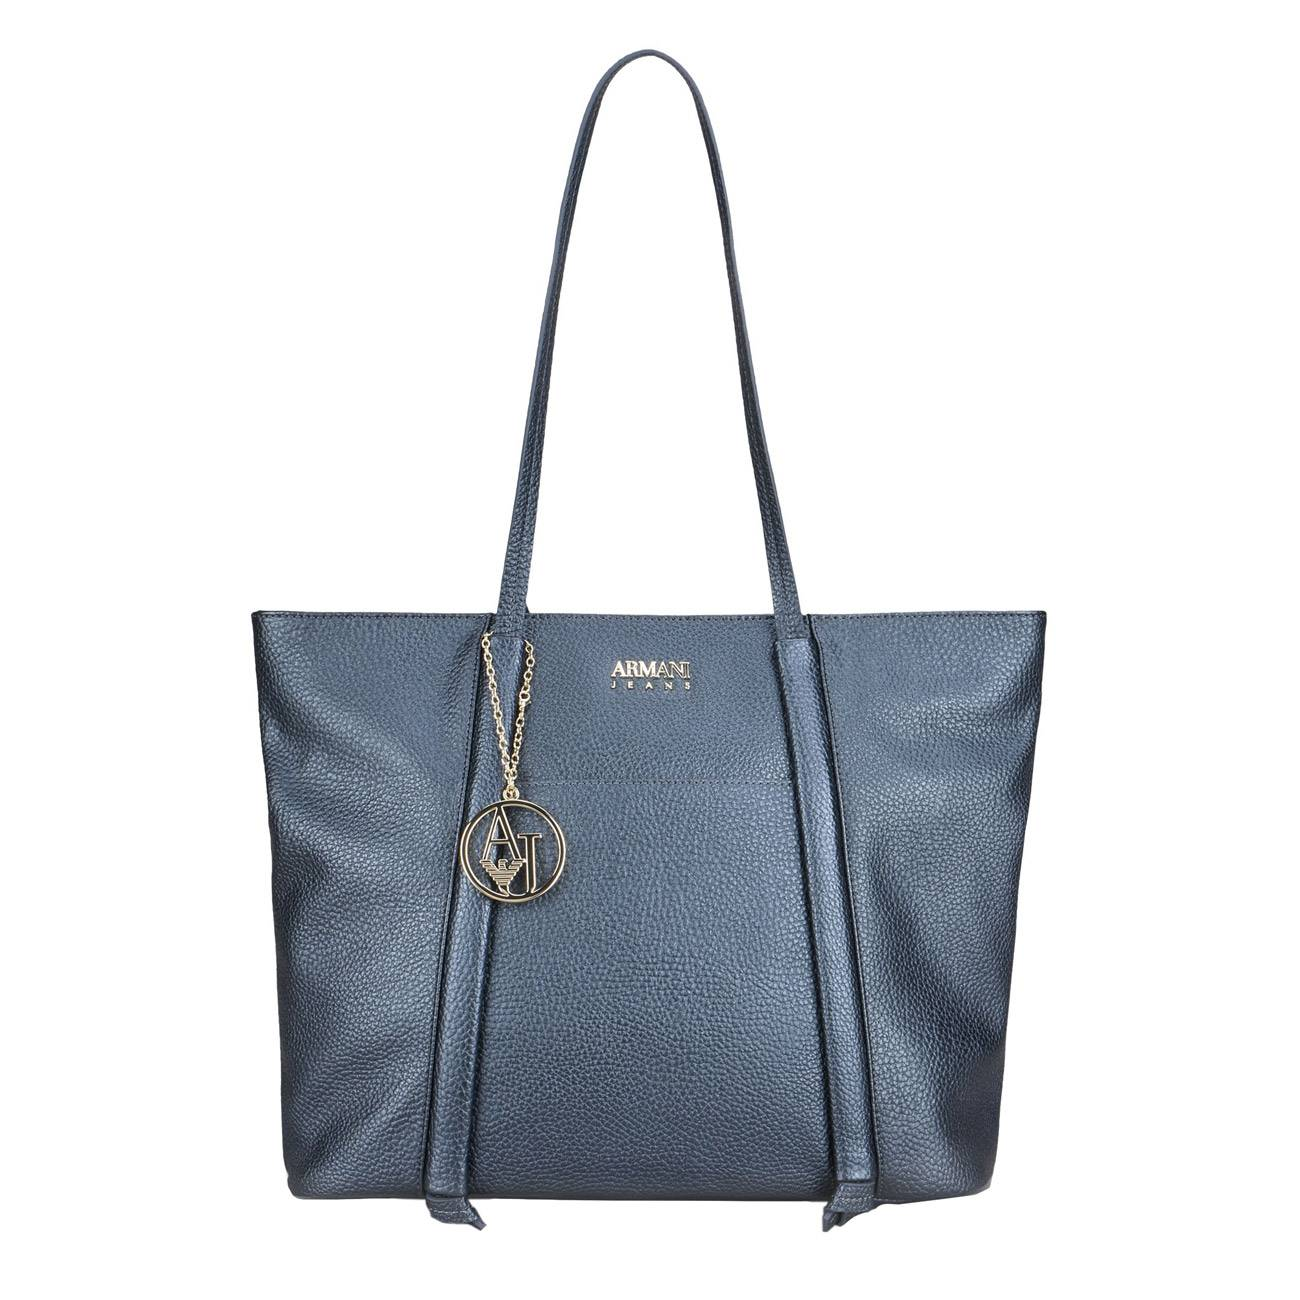 NAVY BLUE SHOPPER BAG